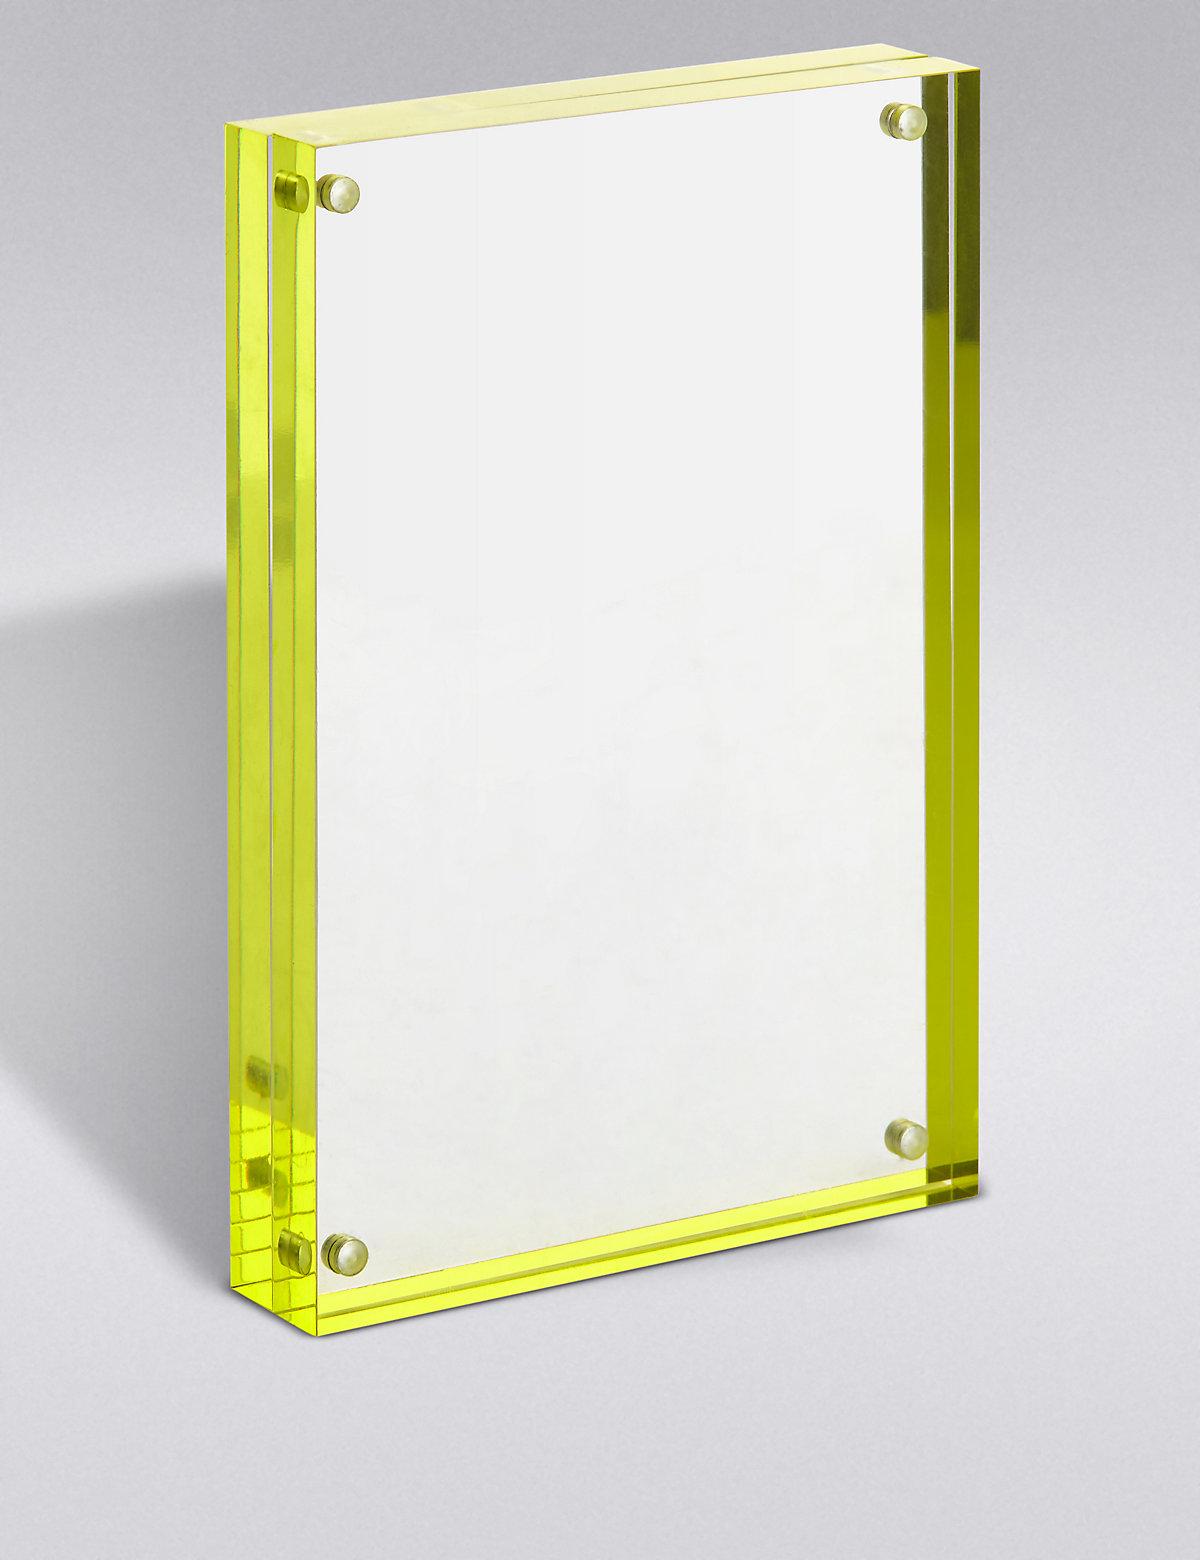 LOFT Acrylic Photo Frame 10 x 15cm (4 x 6inch)